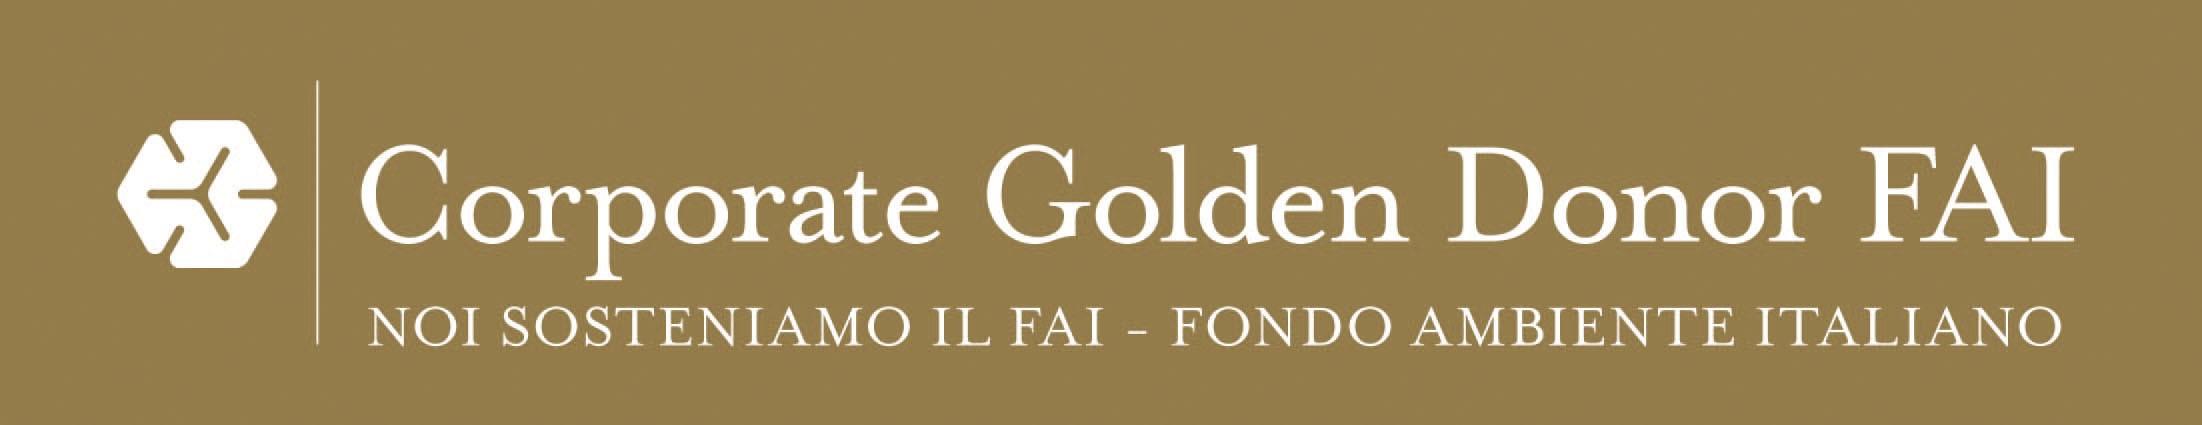 FAI Golden Corporate Donor